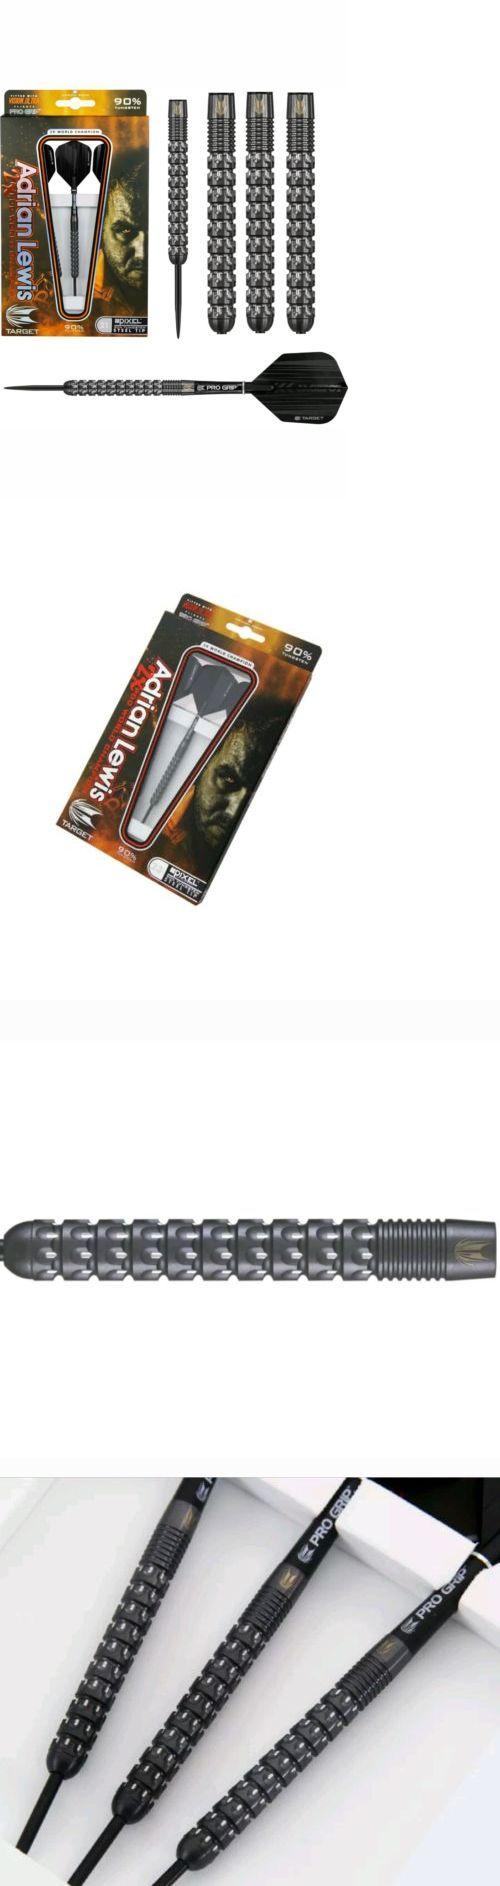 Darts-Steel Tips 26332: Adrian Lewis 23G Black Pixel Darts. U.S. Seller -> BUY IT NOW ONLY: $83 on eBay!